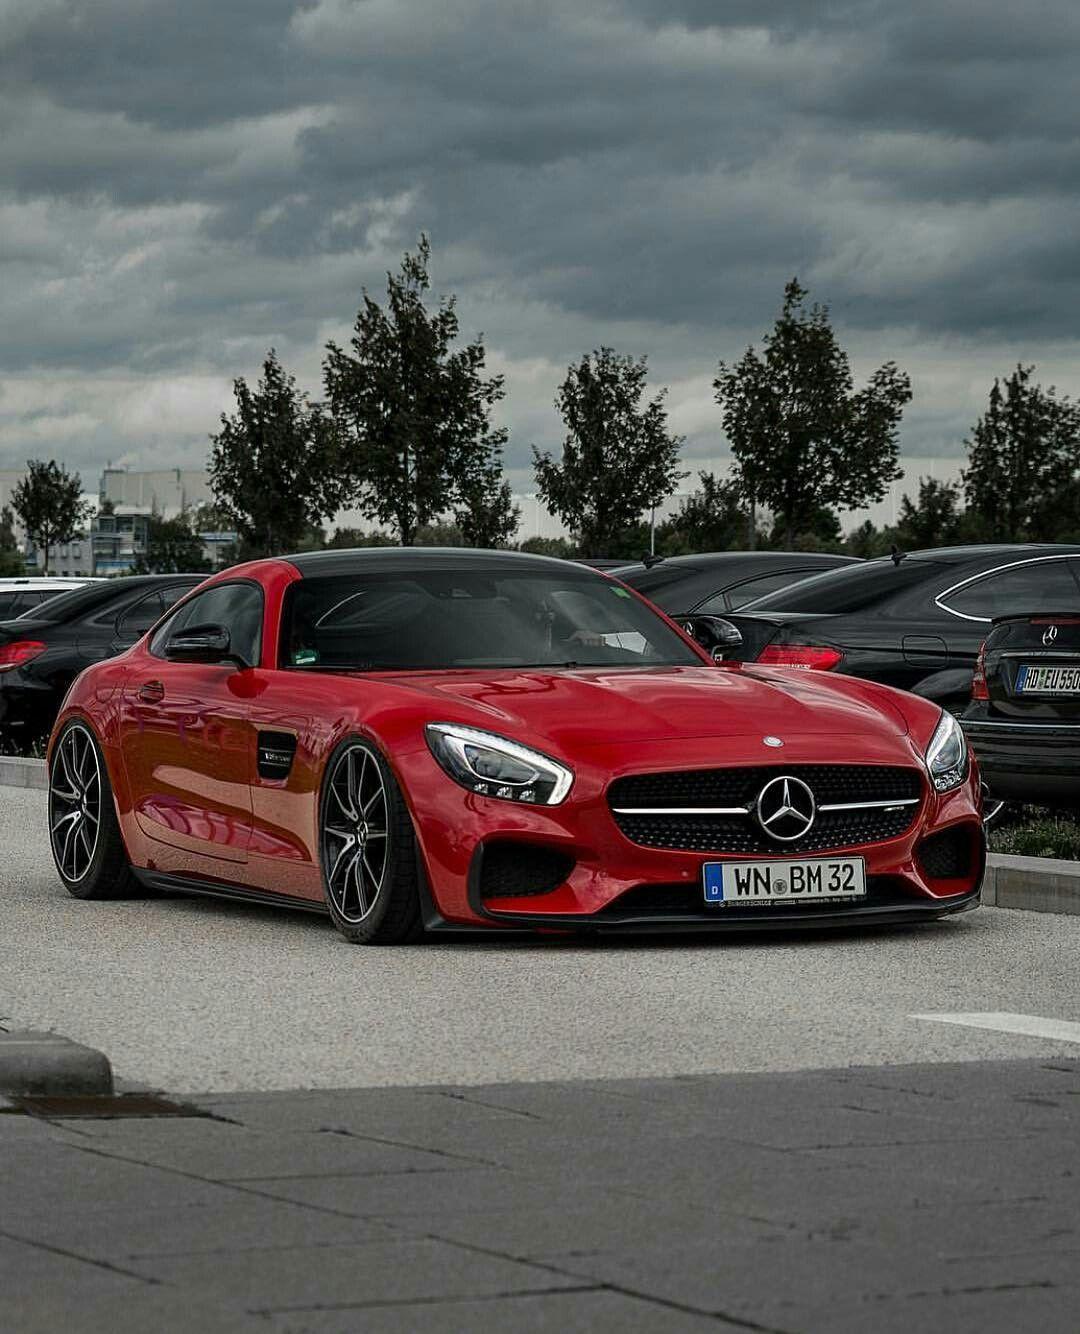 4 Door Sports Cars, Benz, Mercedes